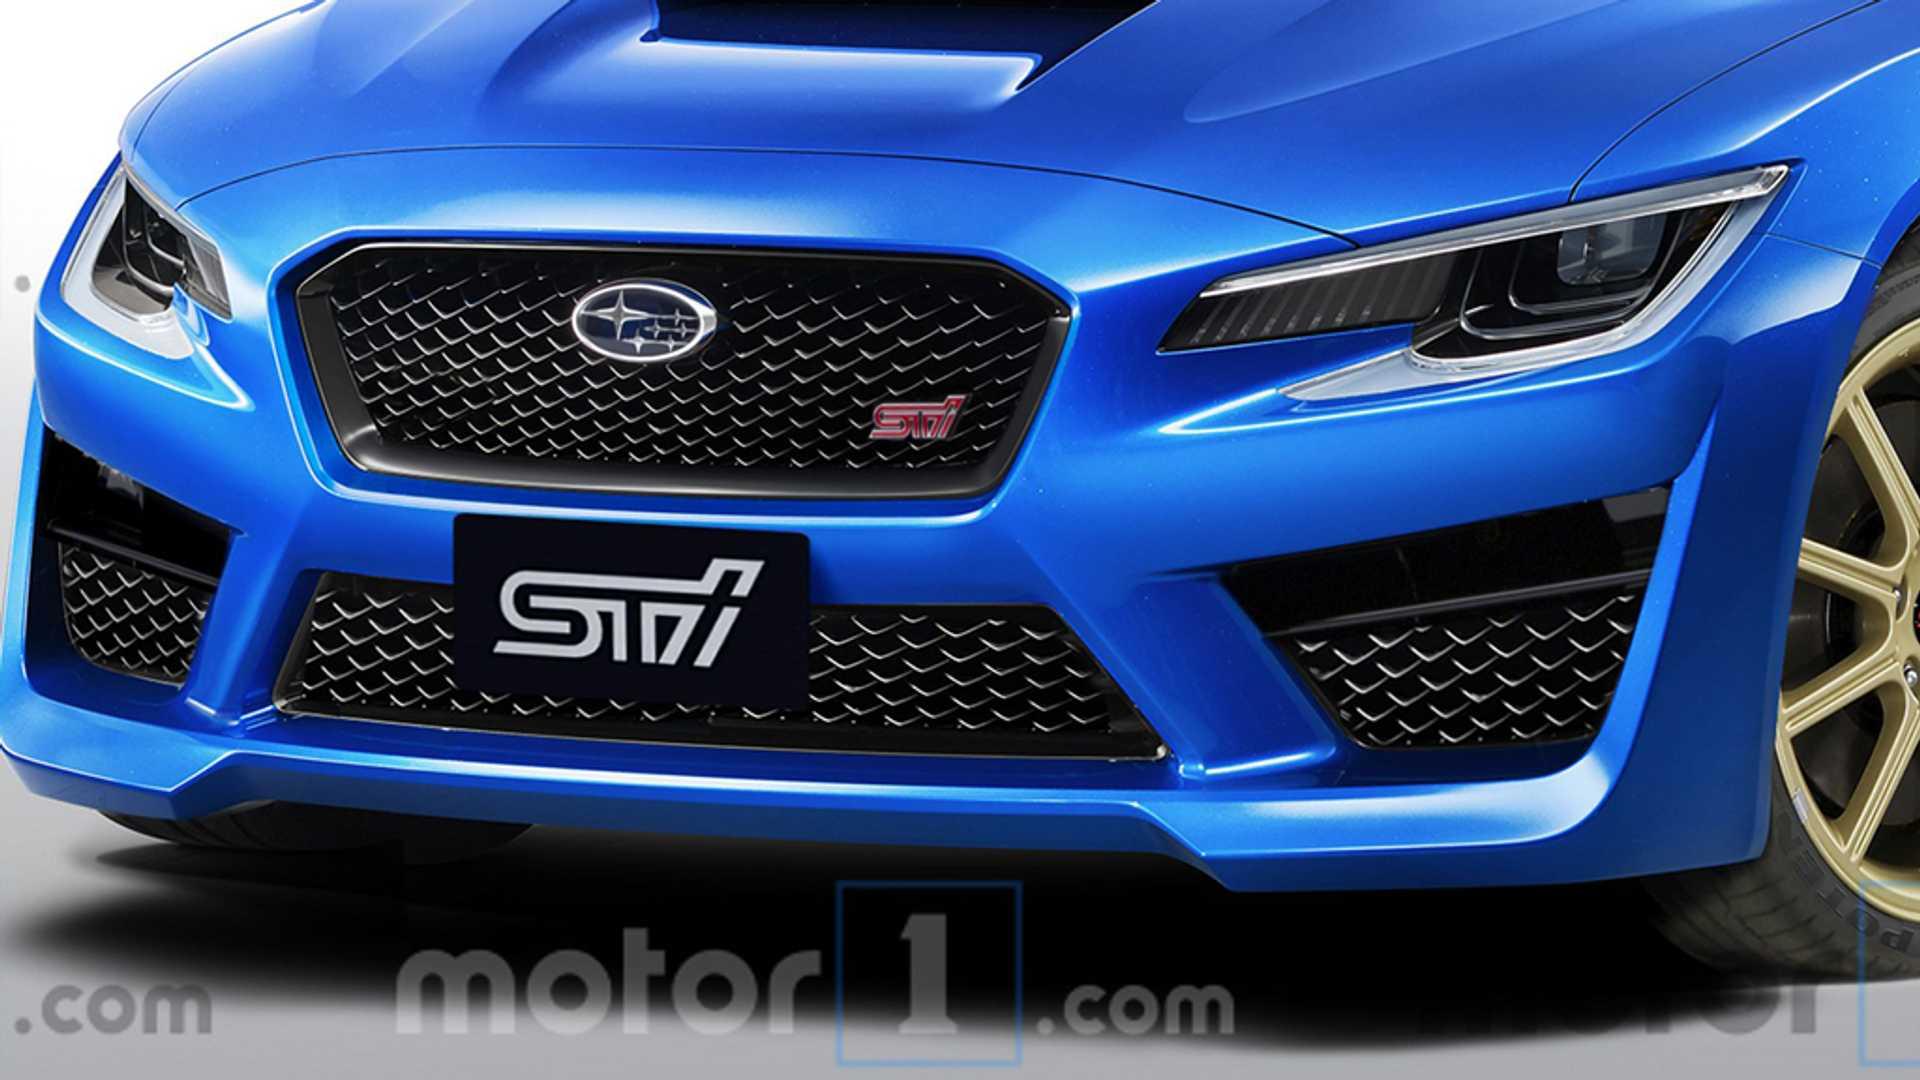 42 Concept of Subaru Brz Sti 2020 Configurations for Subaru Brz Sti 2020